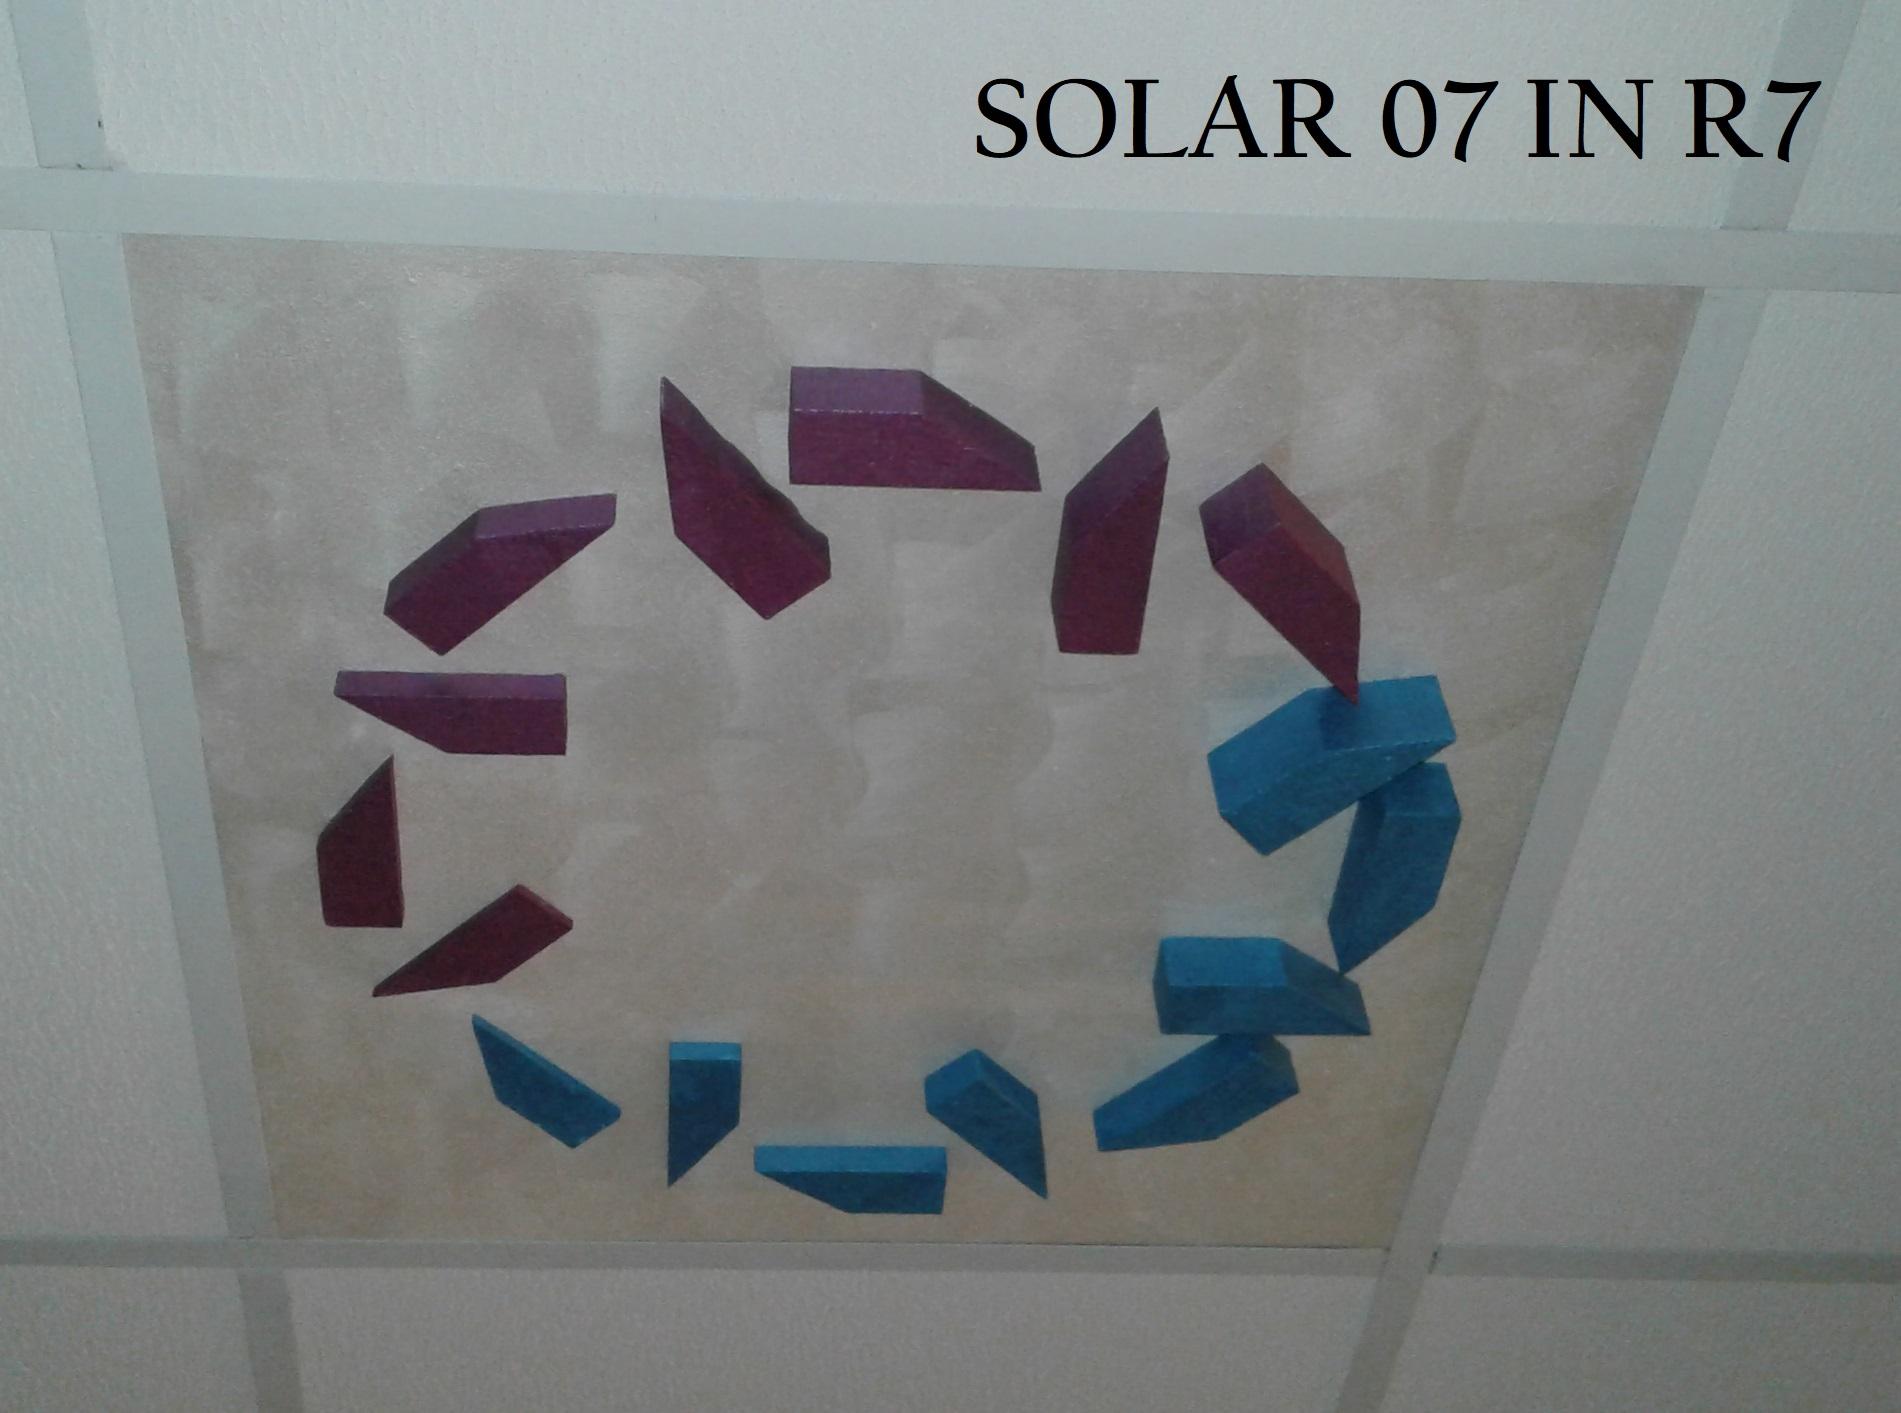 SOLAR 07 IN R7